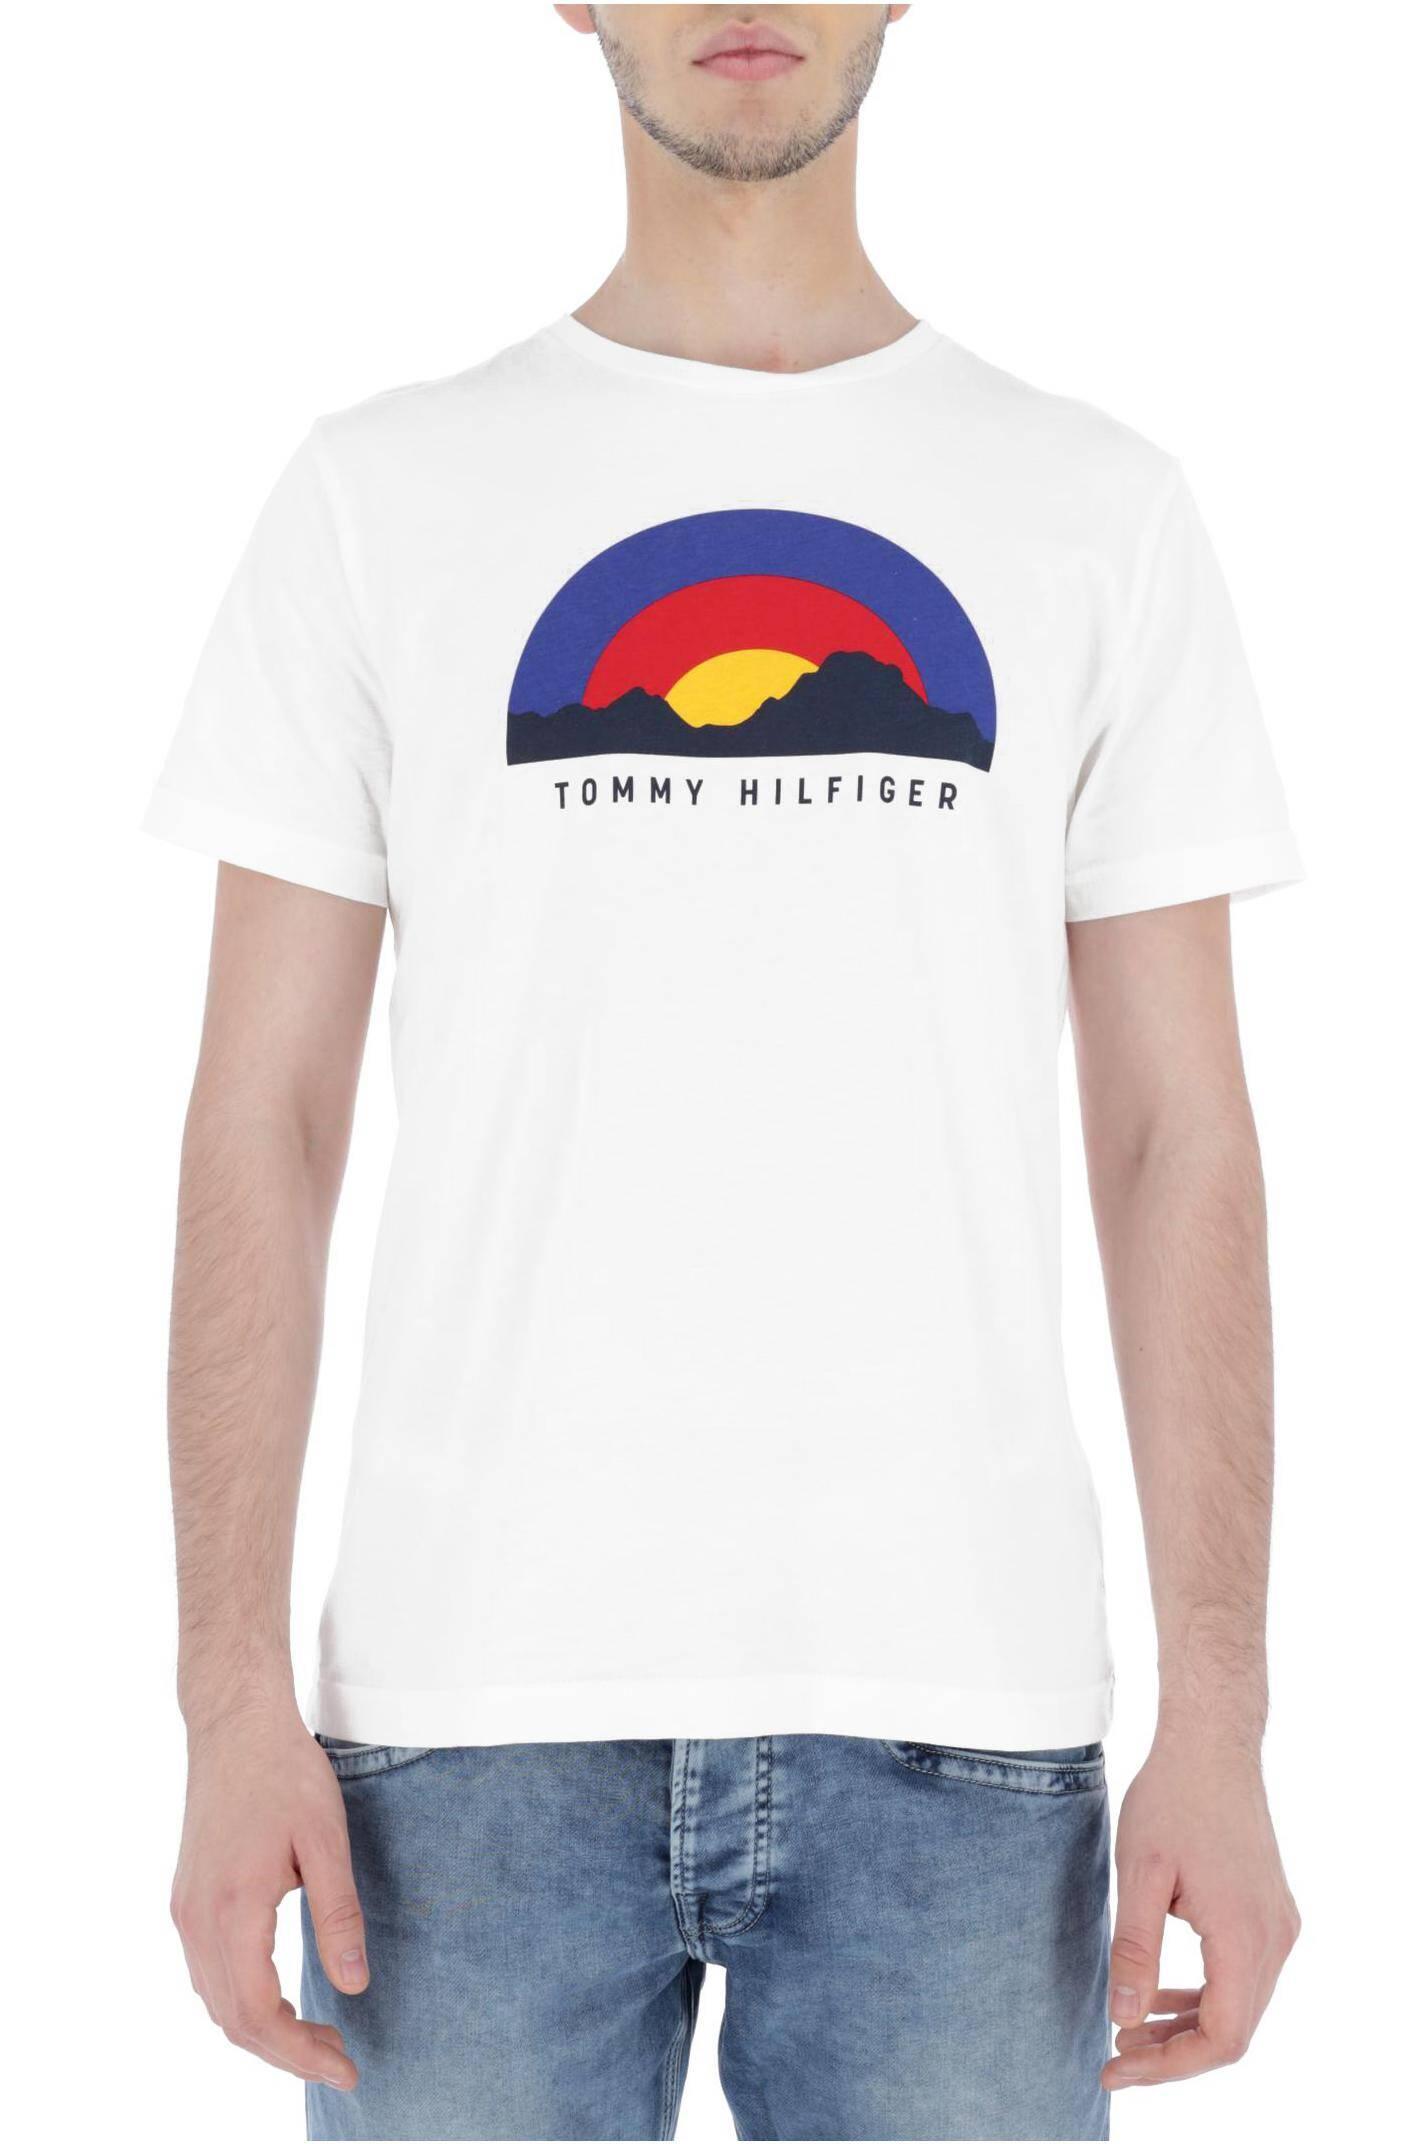 c290317b8a T-shirt SUNRISE GRAPHIC | Regular Fit Tommy Hilfiger | Biały | Gomez.pl